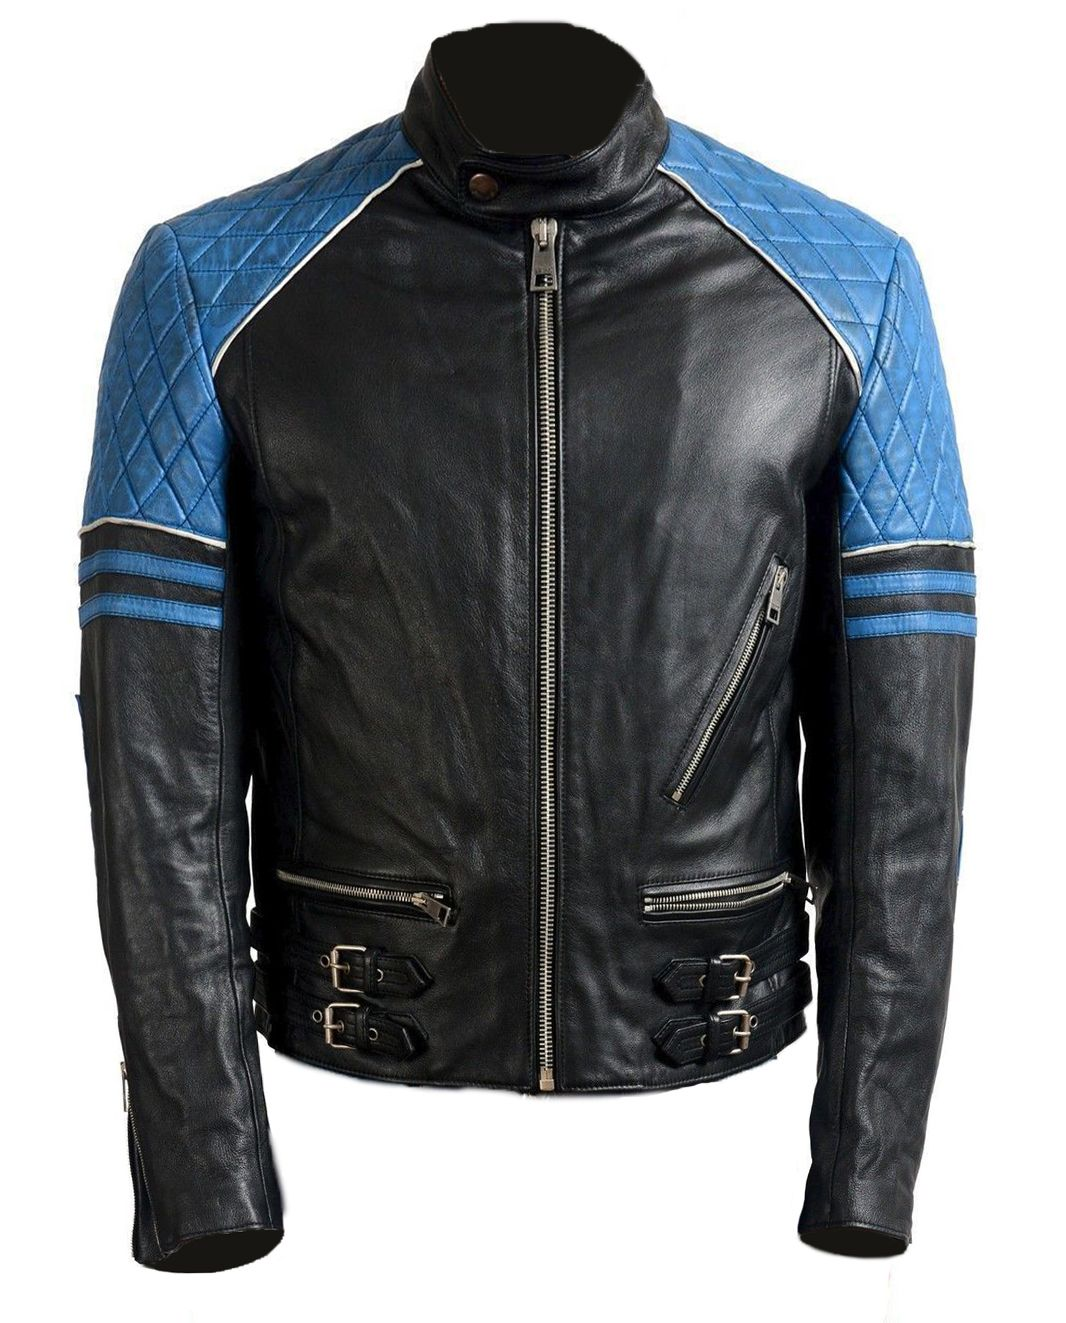 New Handmade Men Black Blue Leather Biker Jacket, Stylish